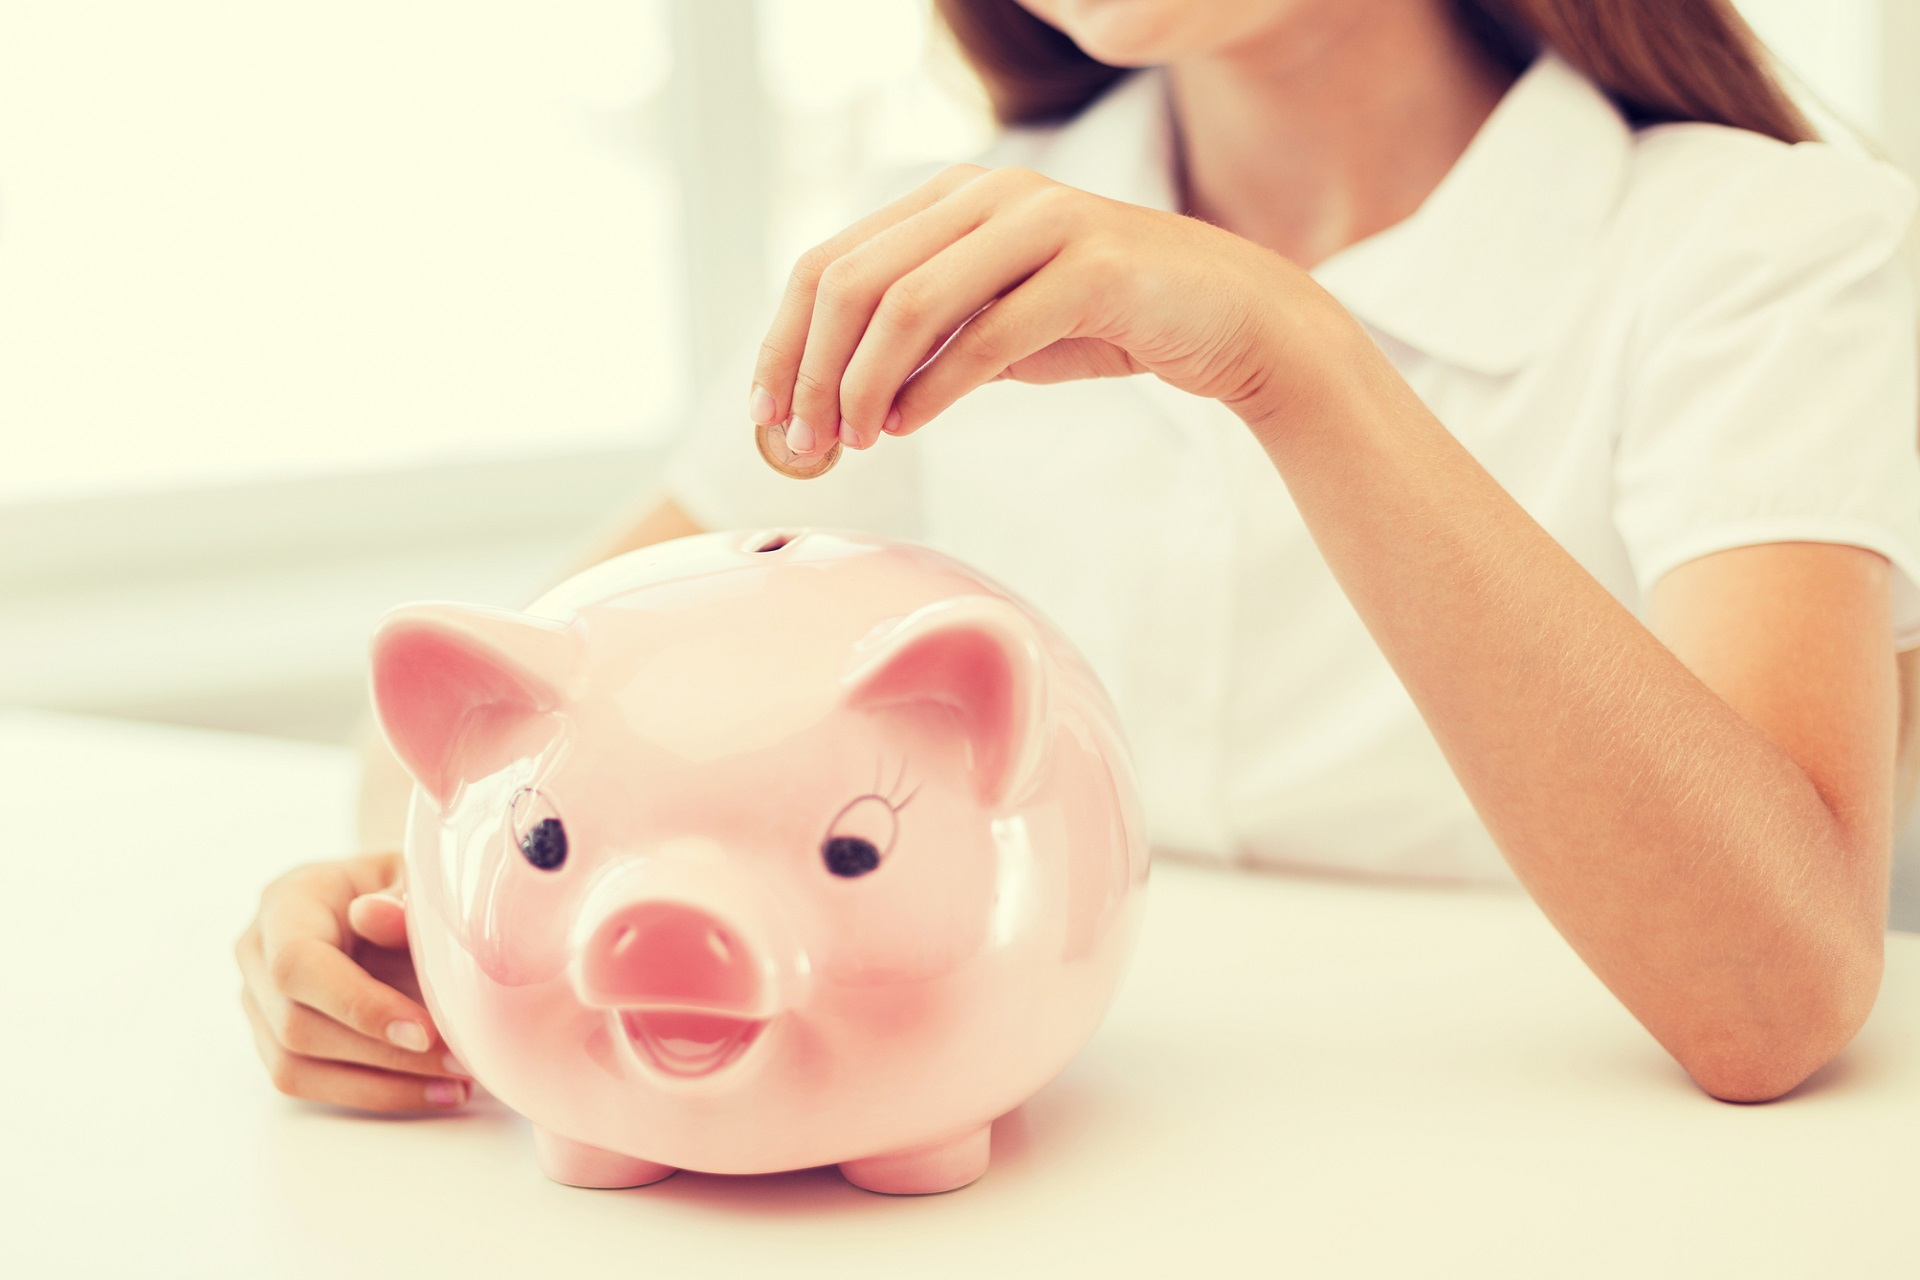 7 Great Financial Habits Everyone Should Develop